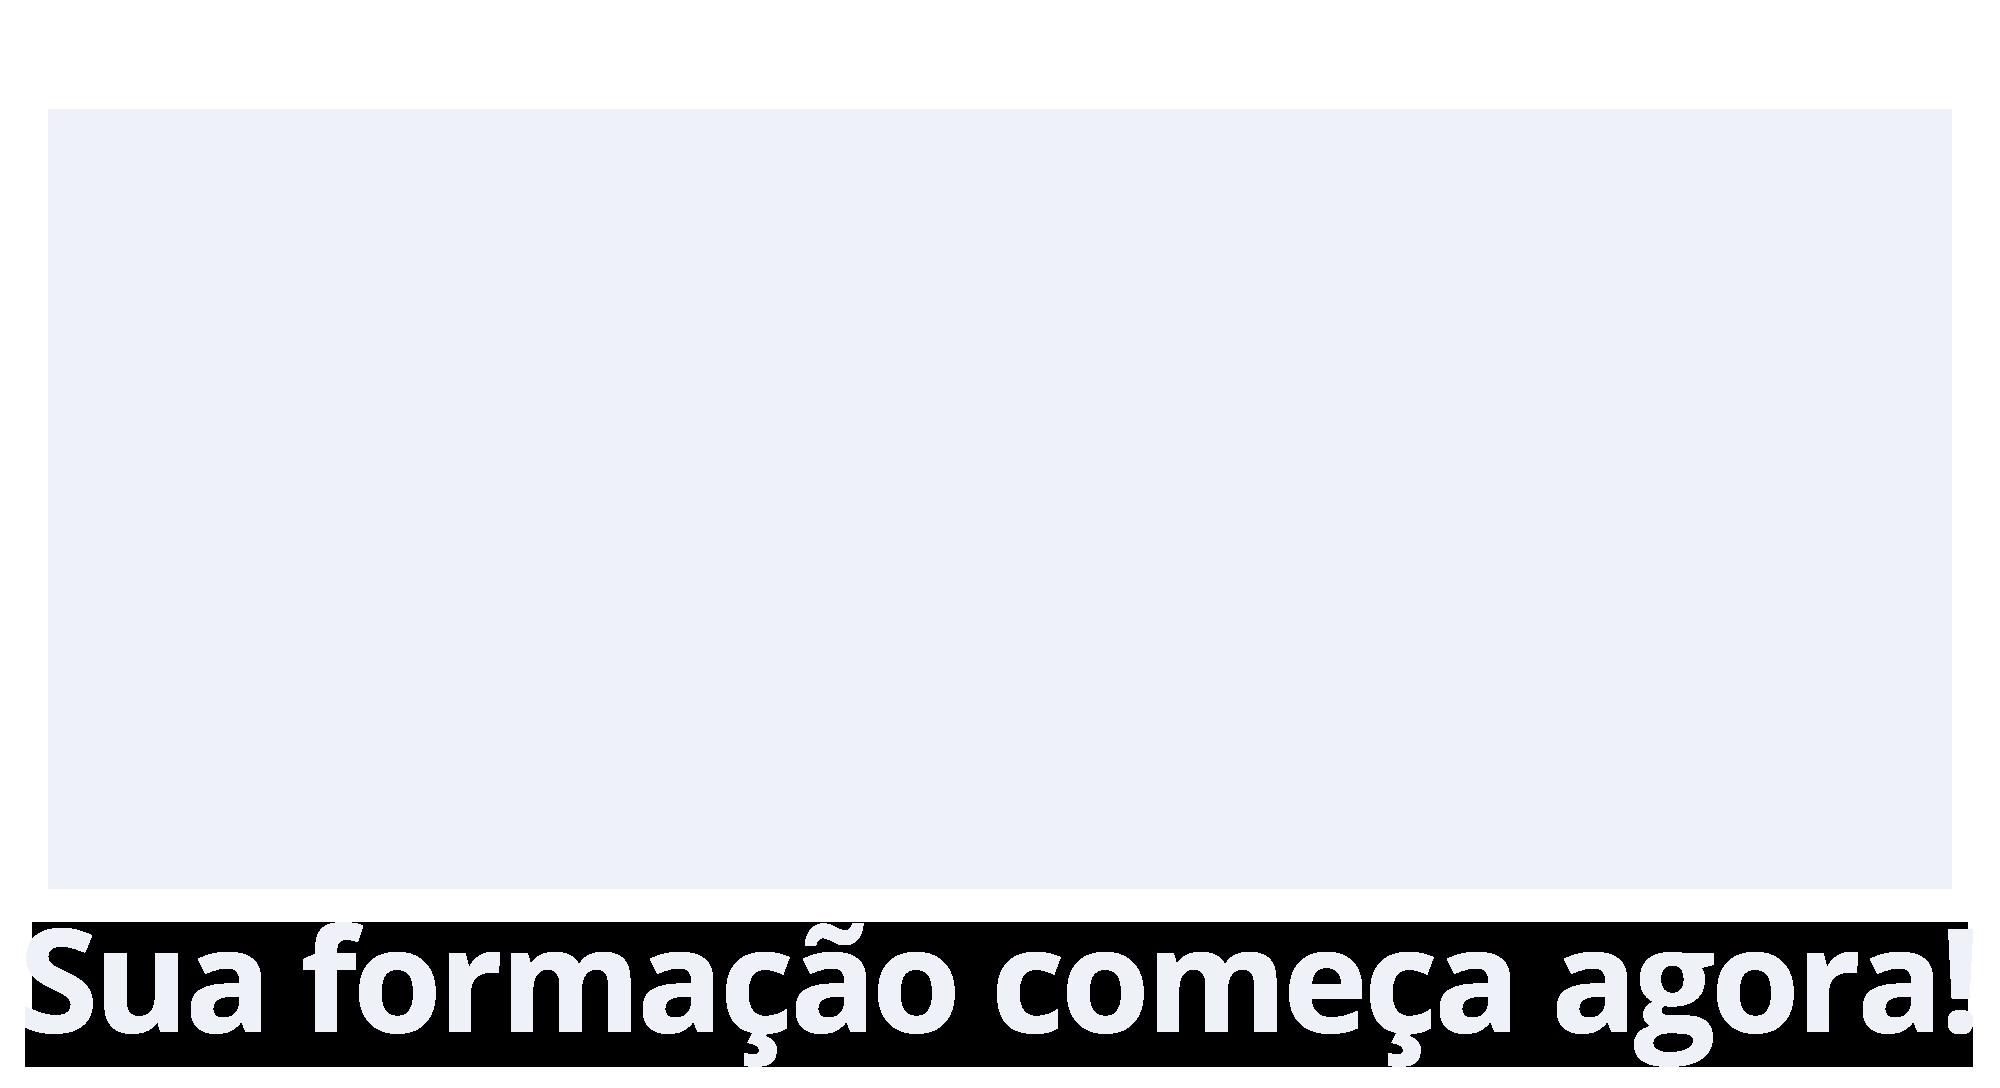 Bolsão Digital